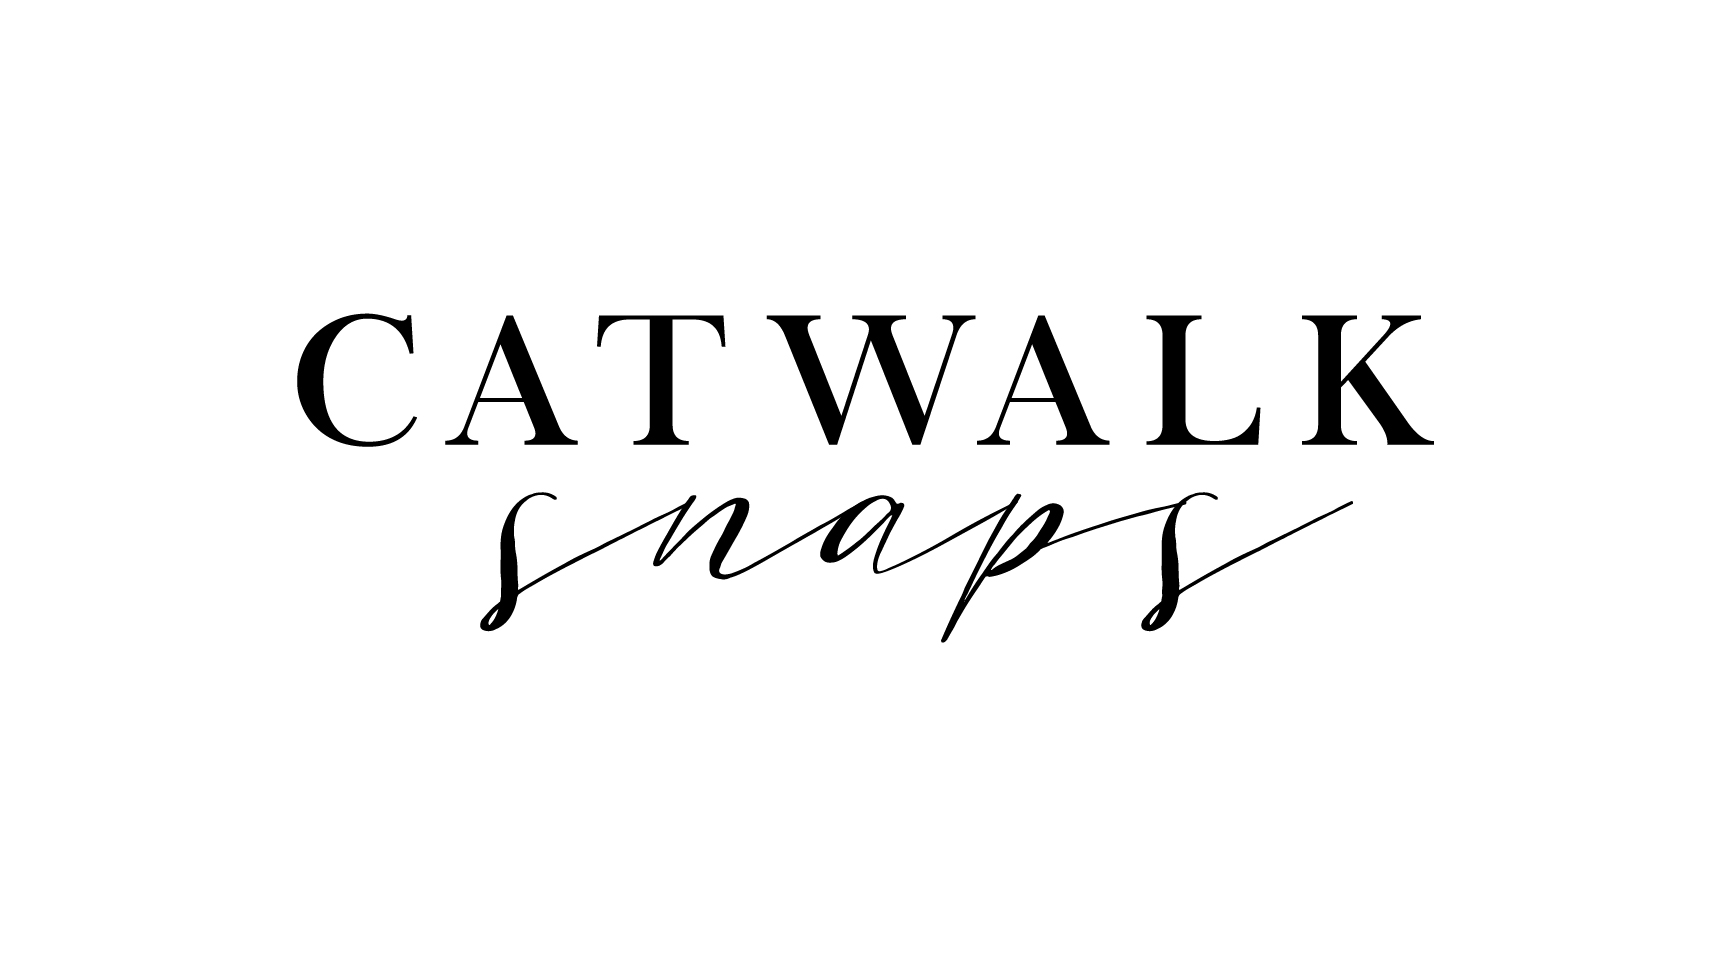 Catwalk snaps